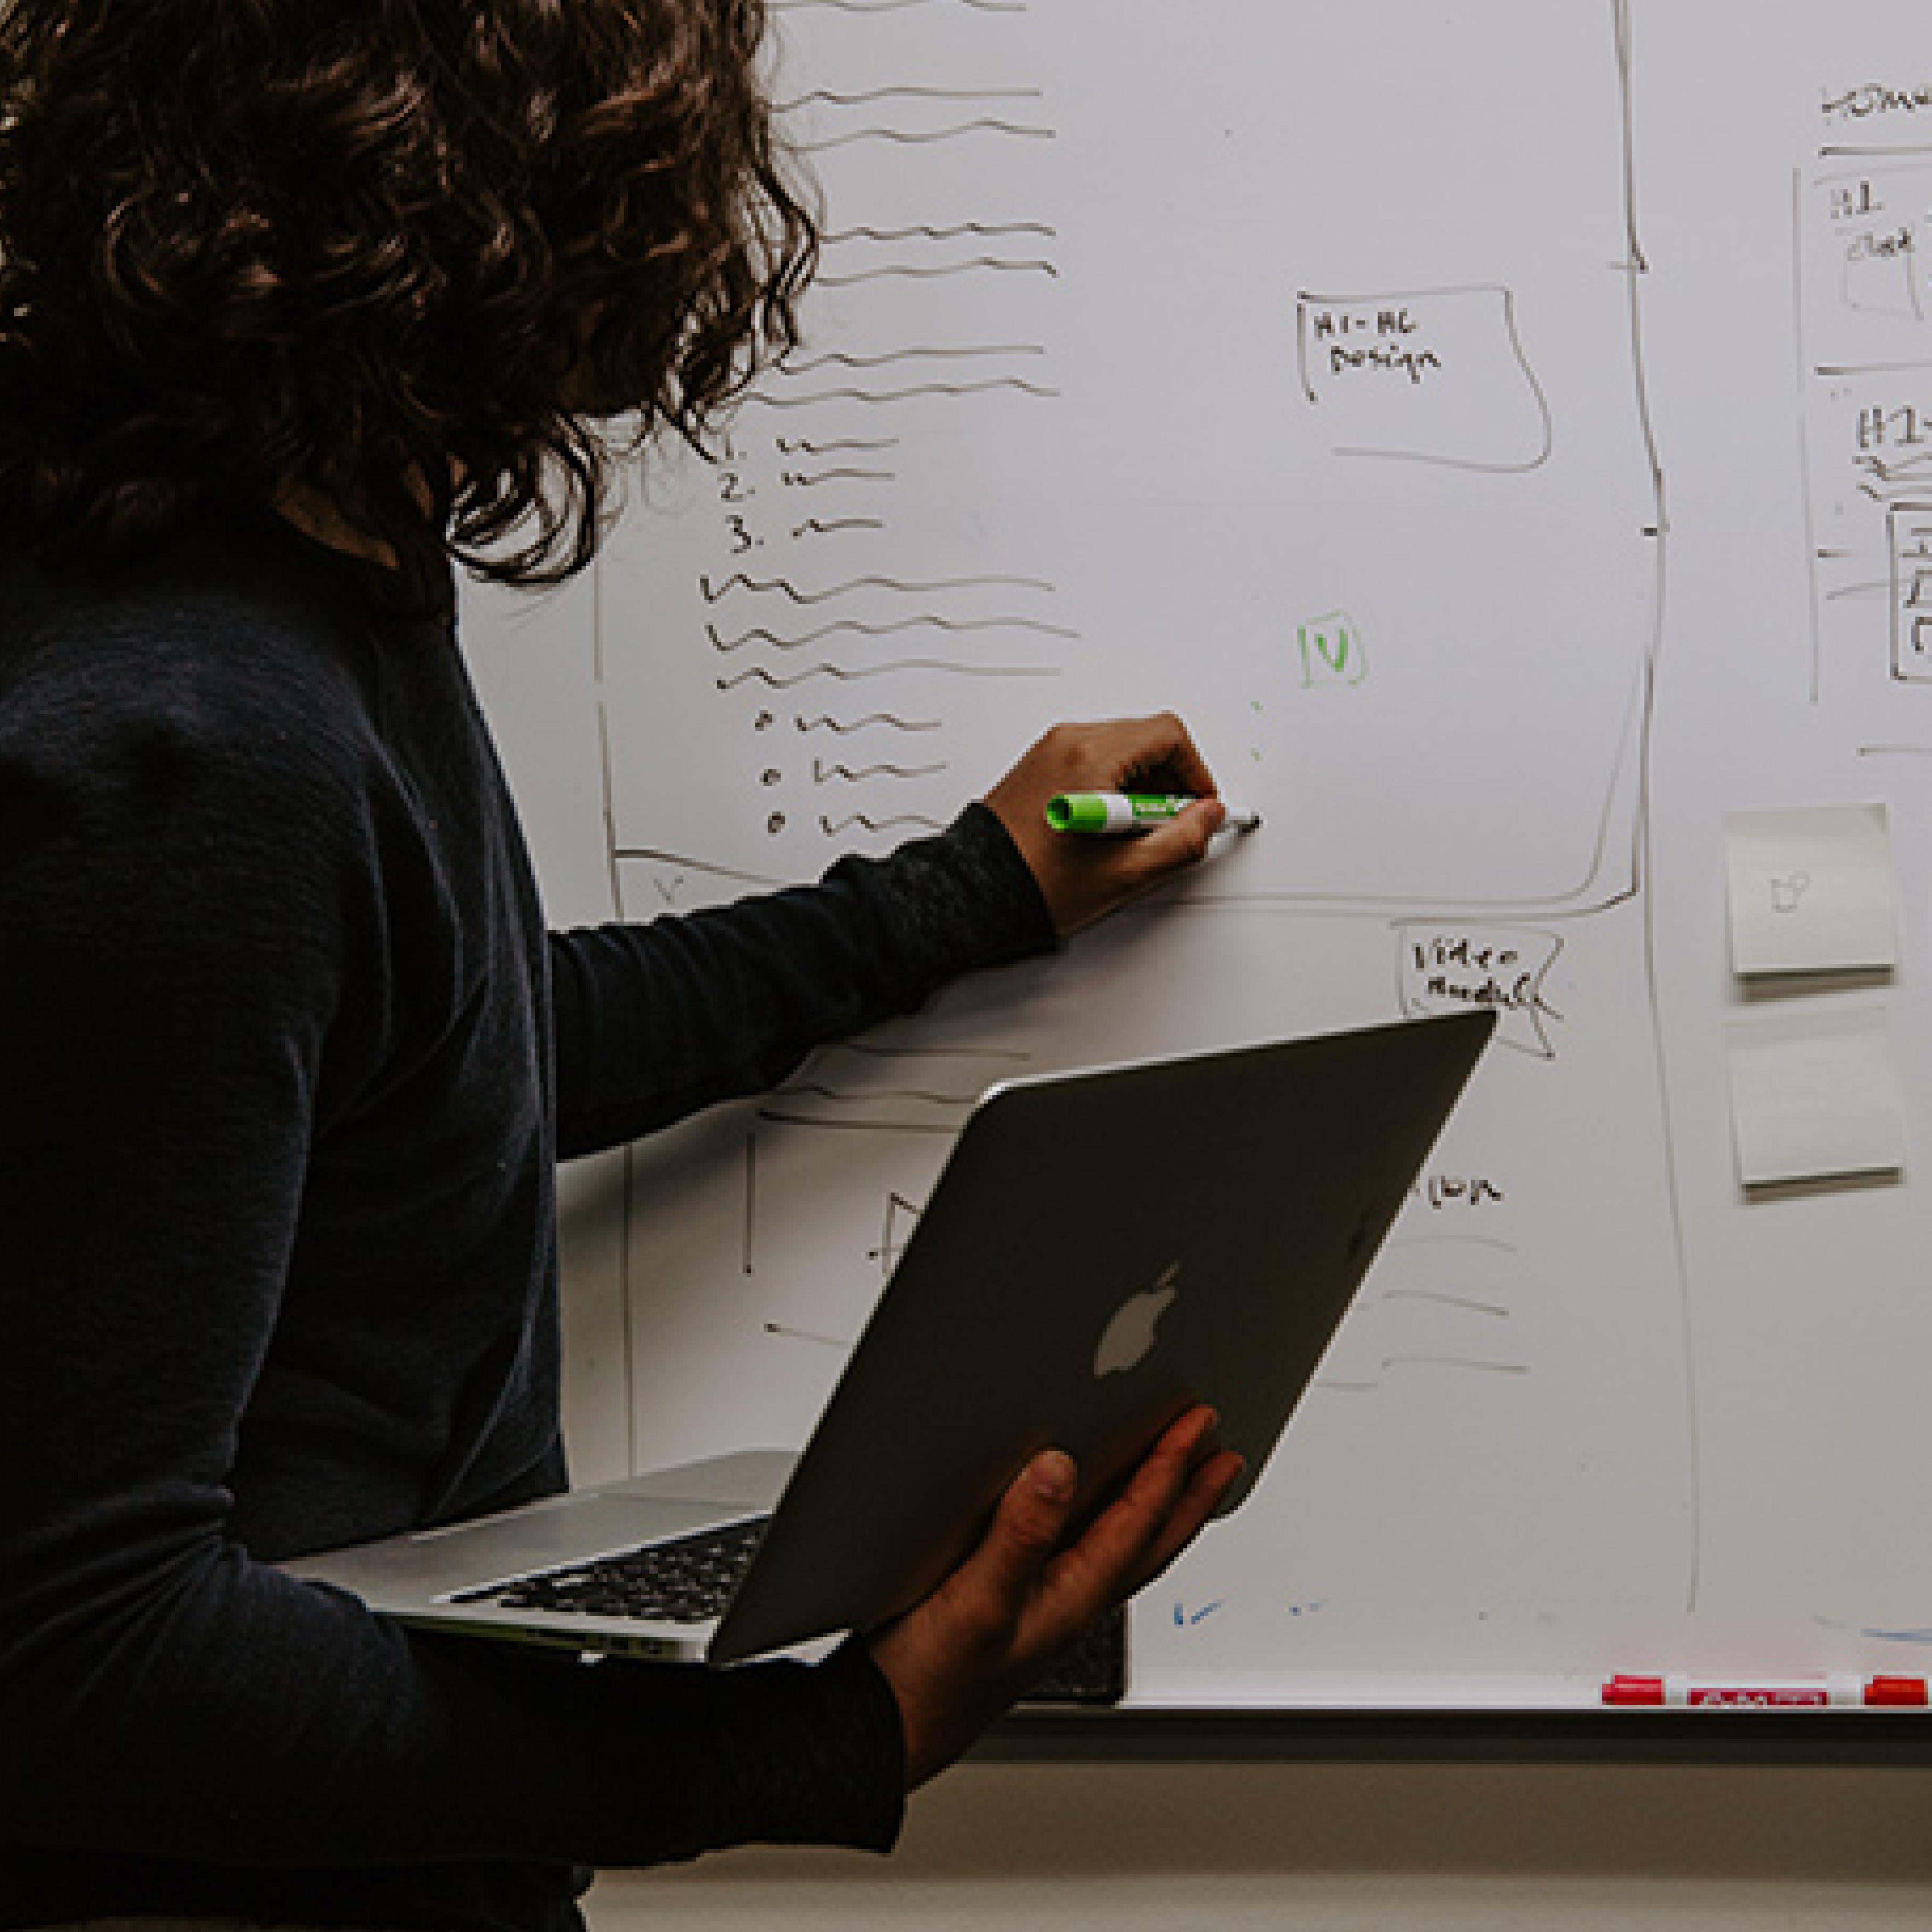 Customer Intelligence, Data, and Insights